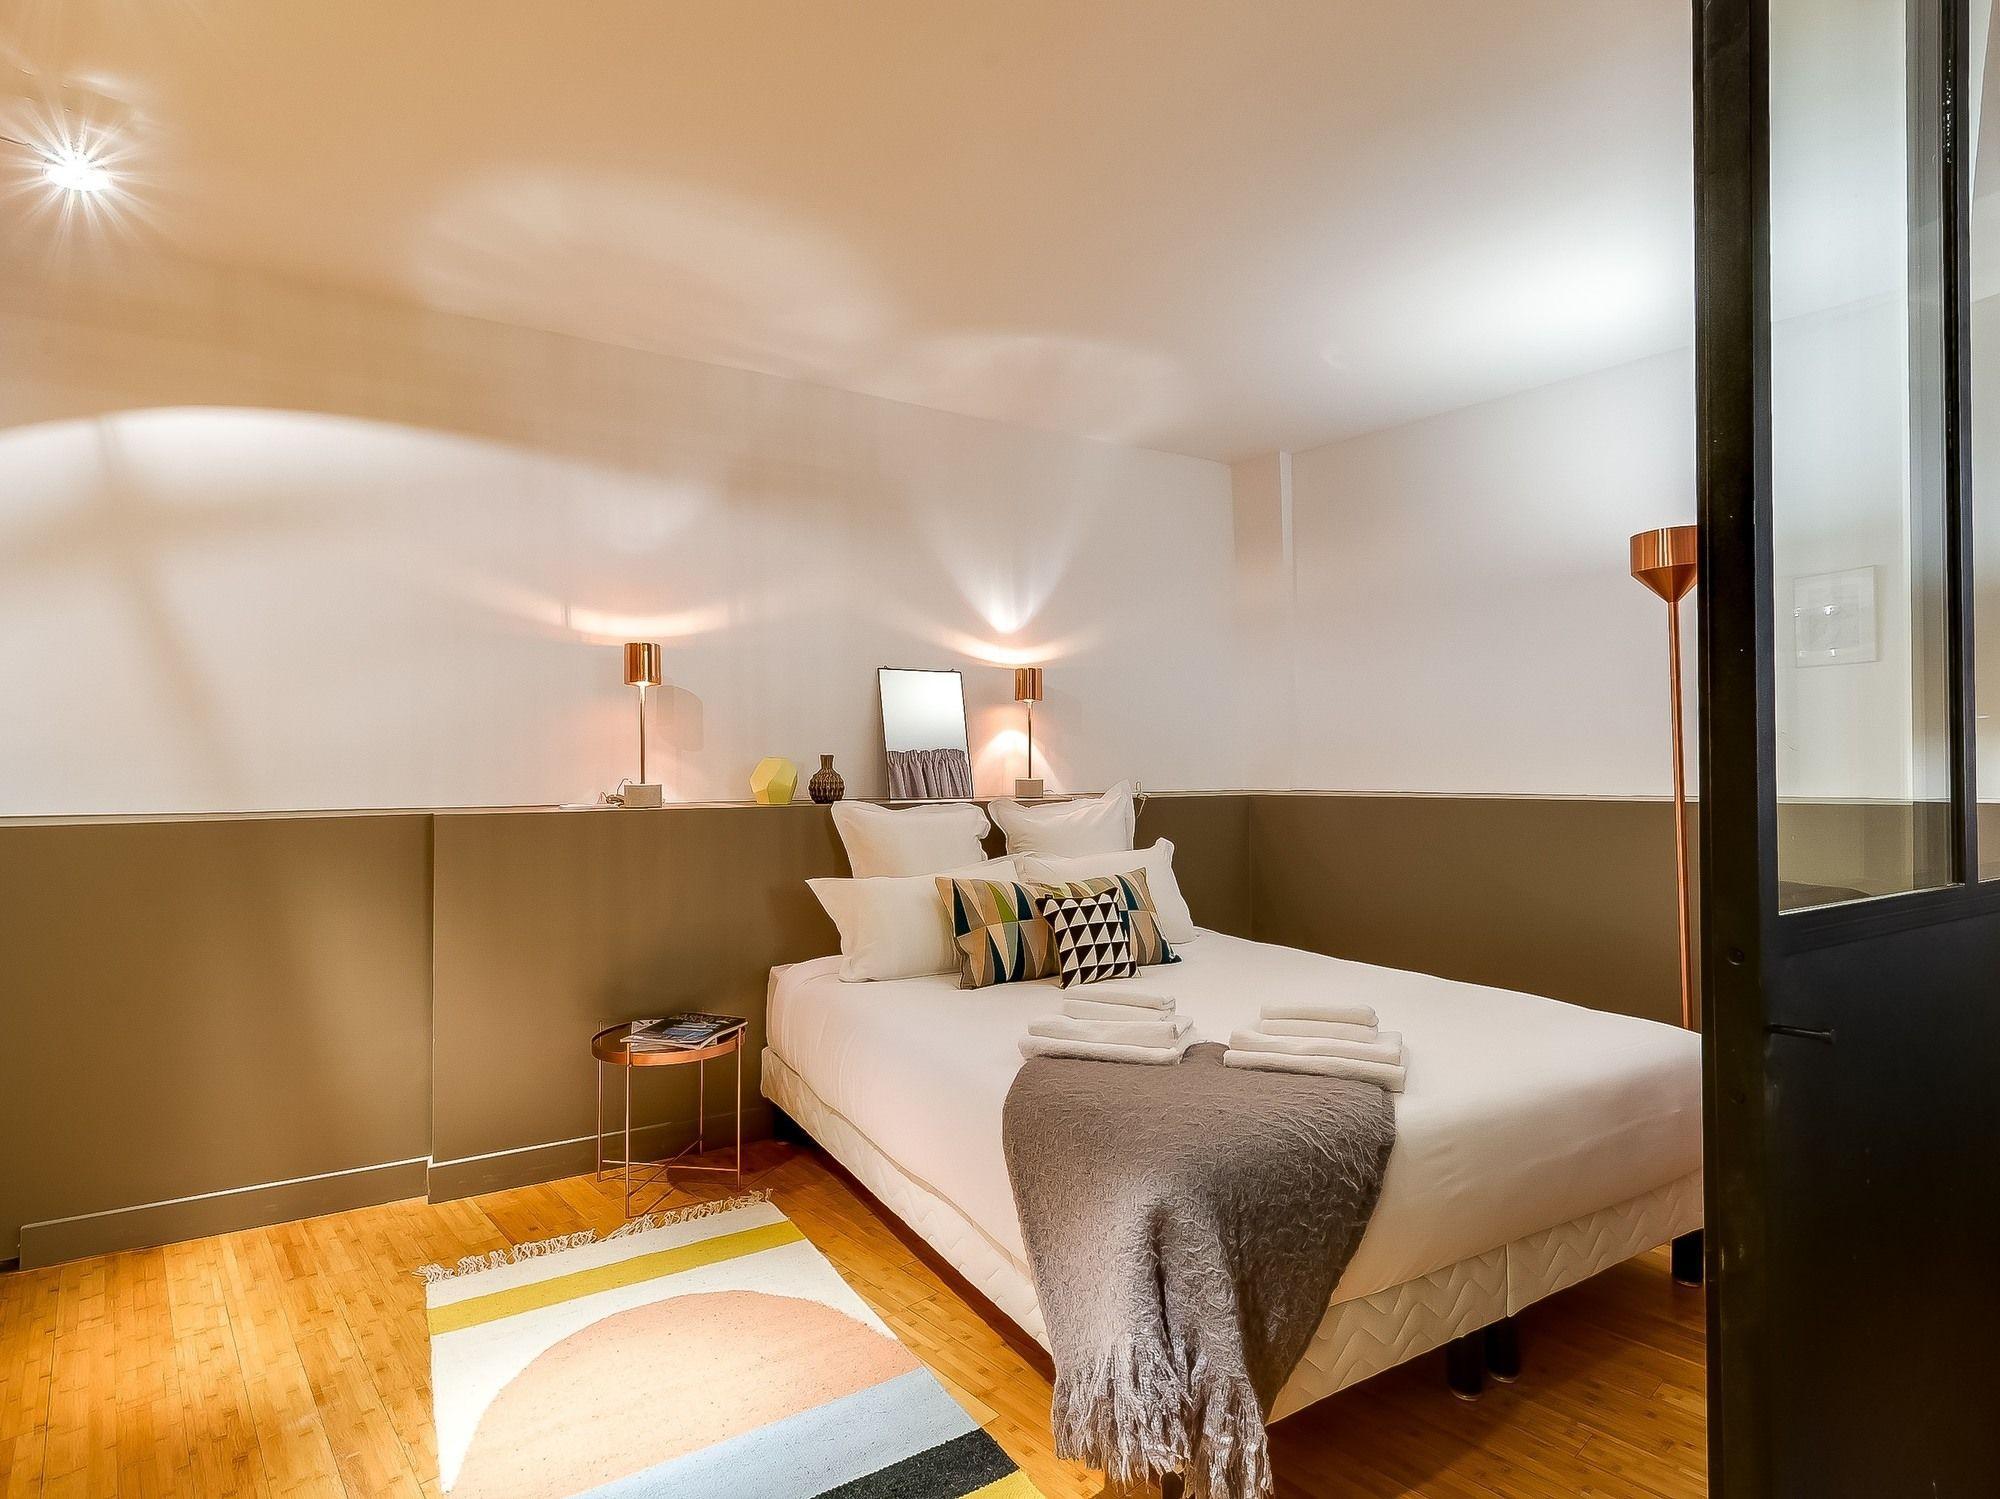 Sweet Inn Apartments Paris - Vaugirard